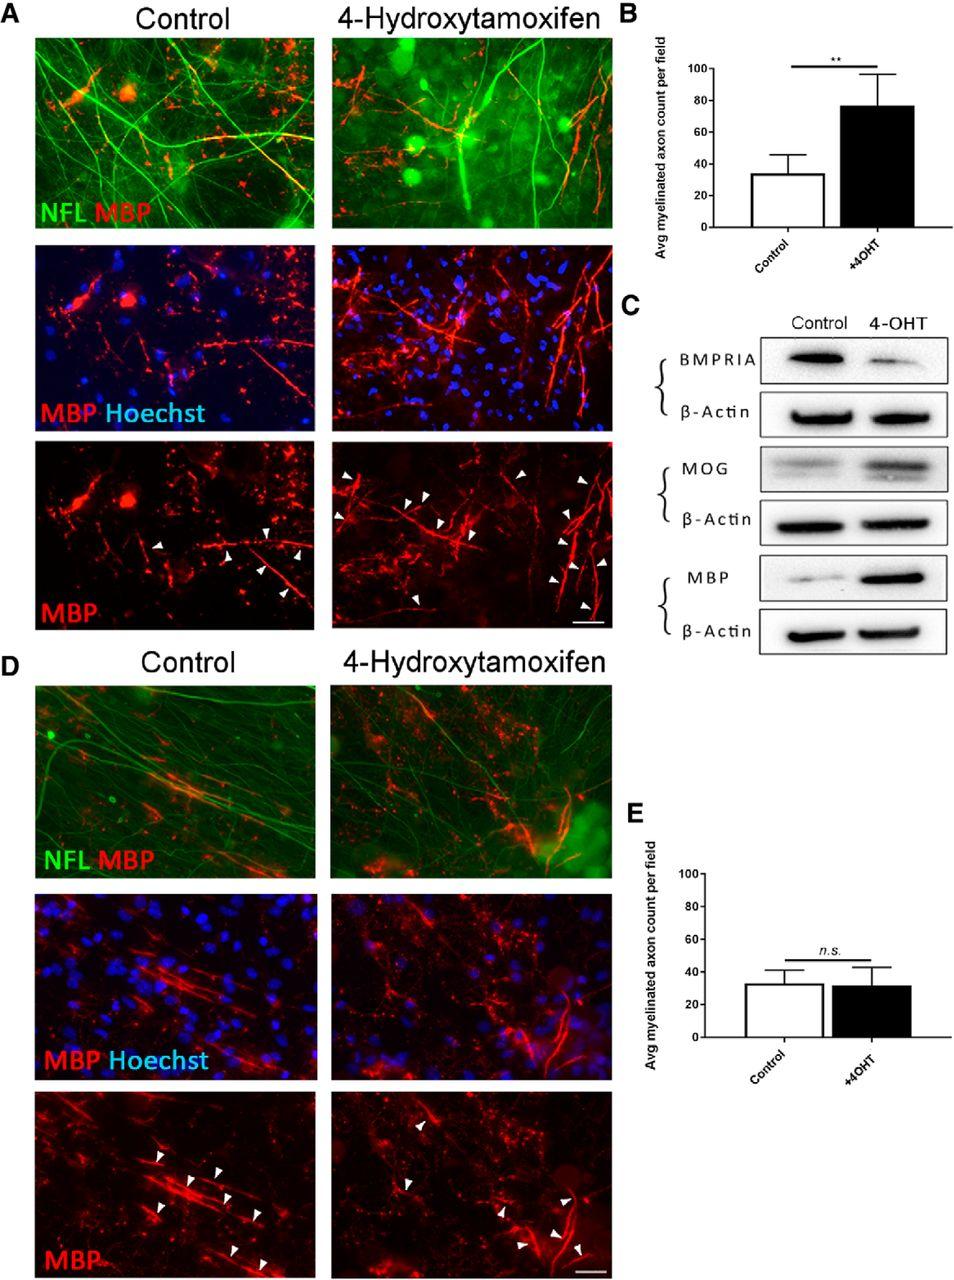 Inhibiting Bone Morphogenetic Protein 4 Type I Receptor